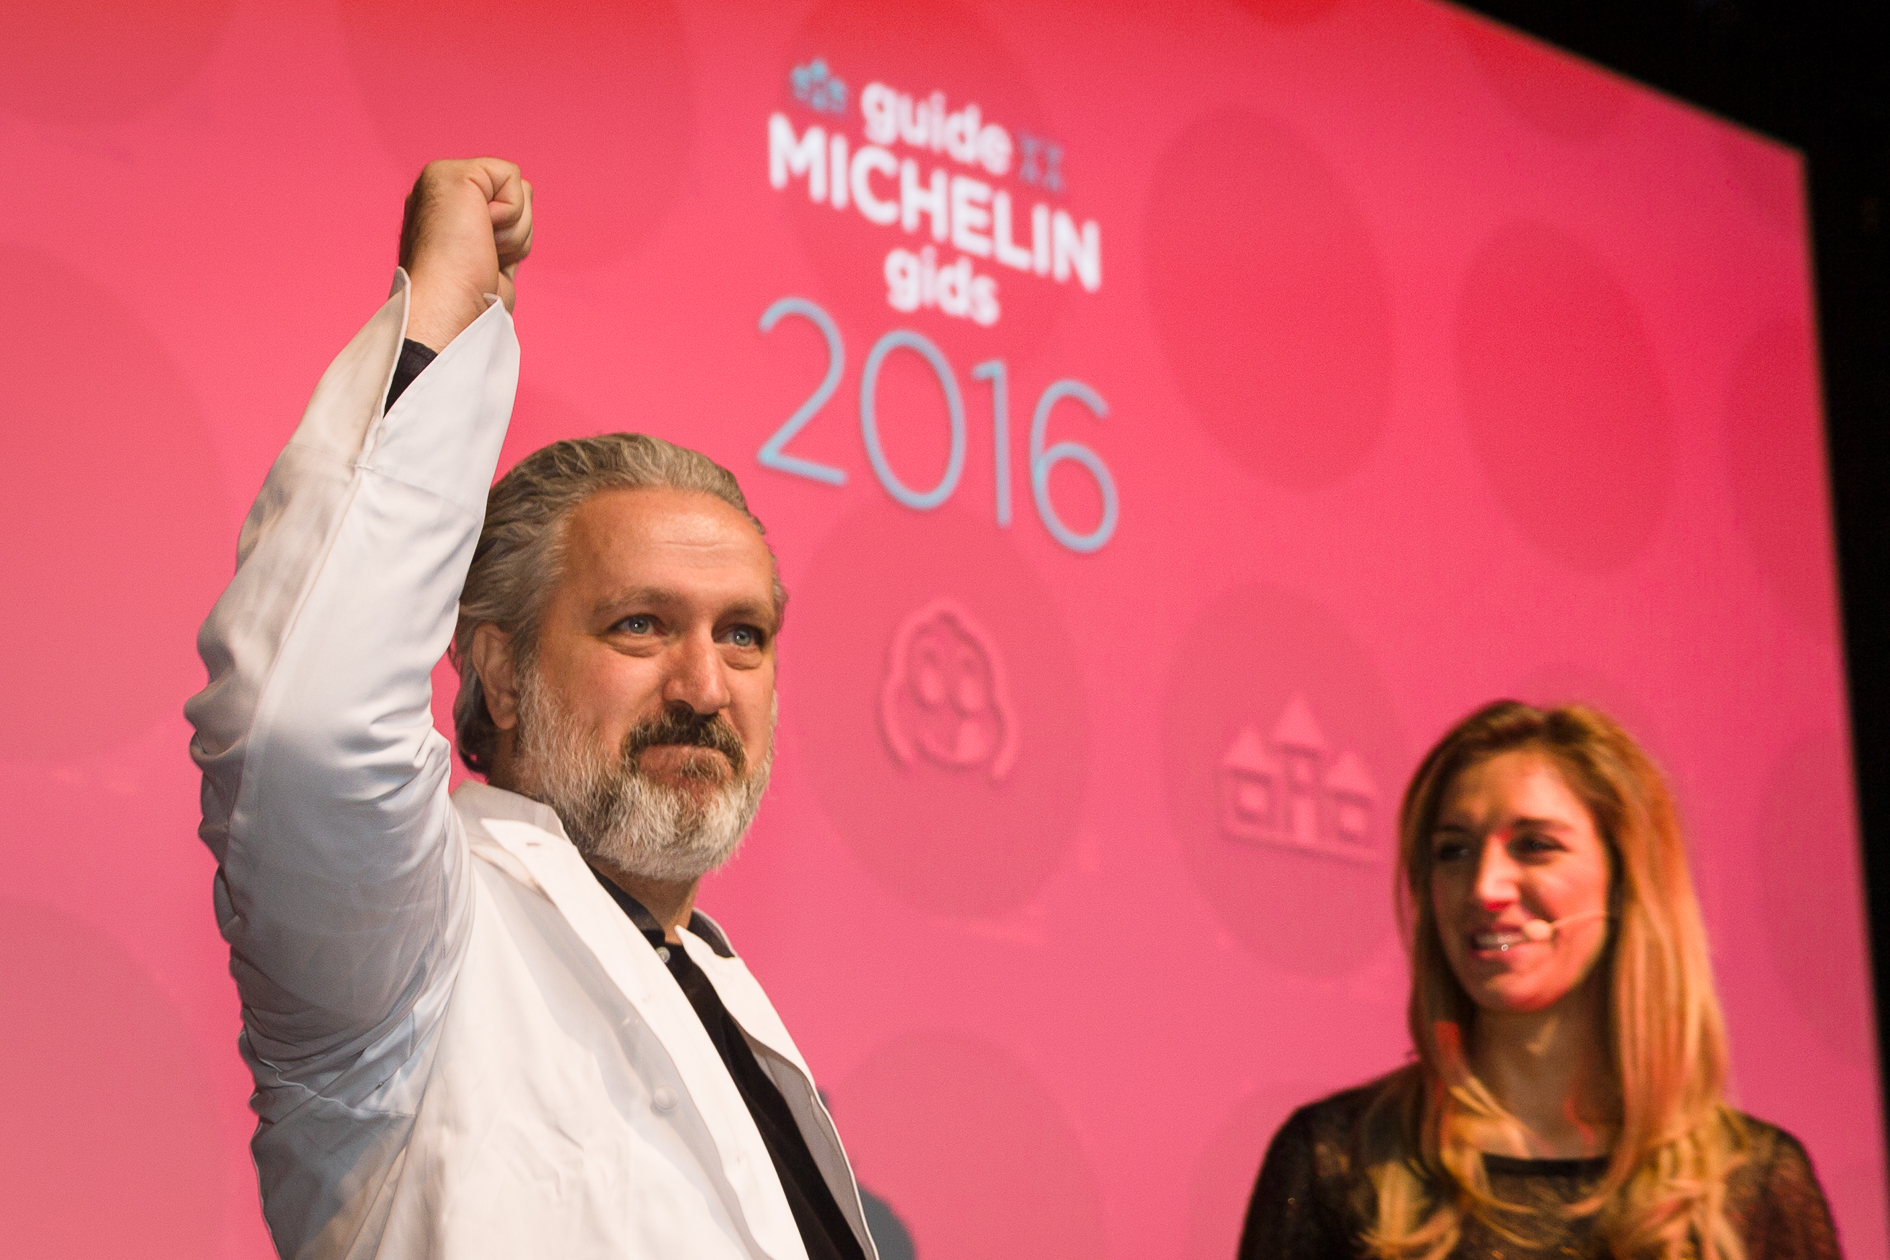 Voorstelling Michelin Gids 2016